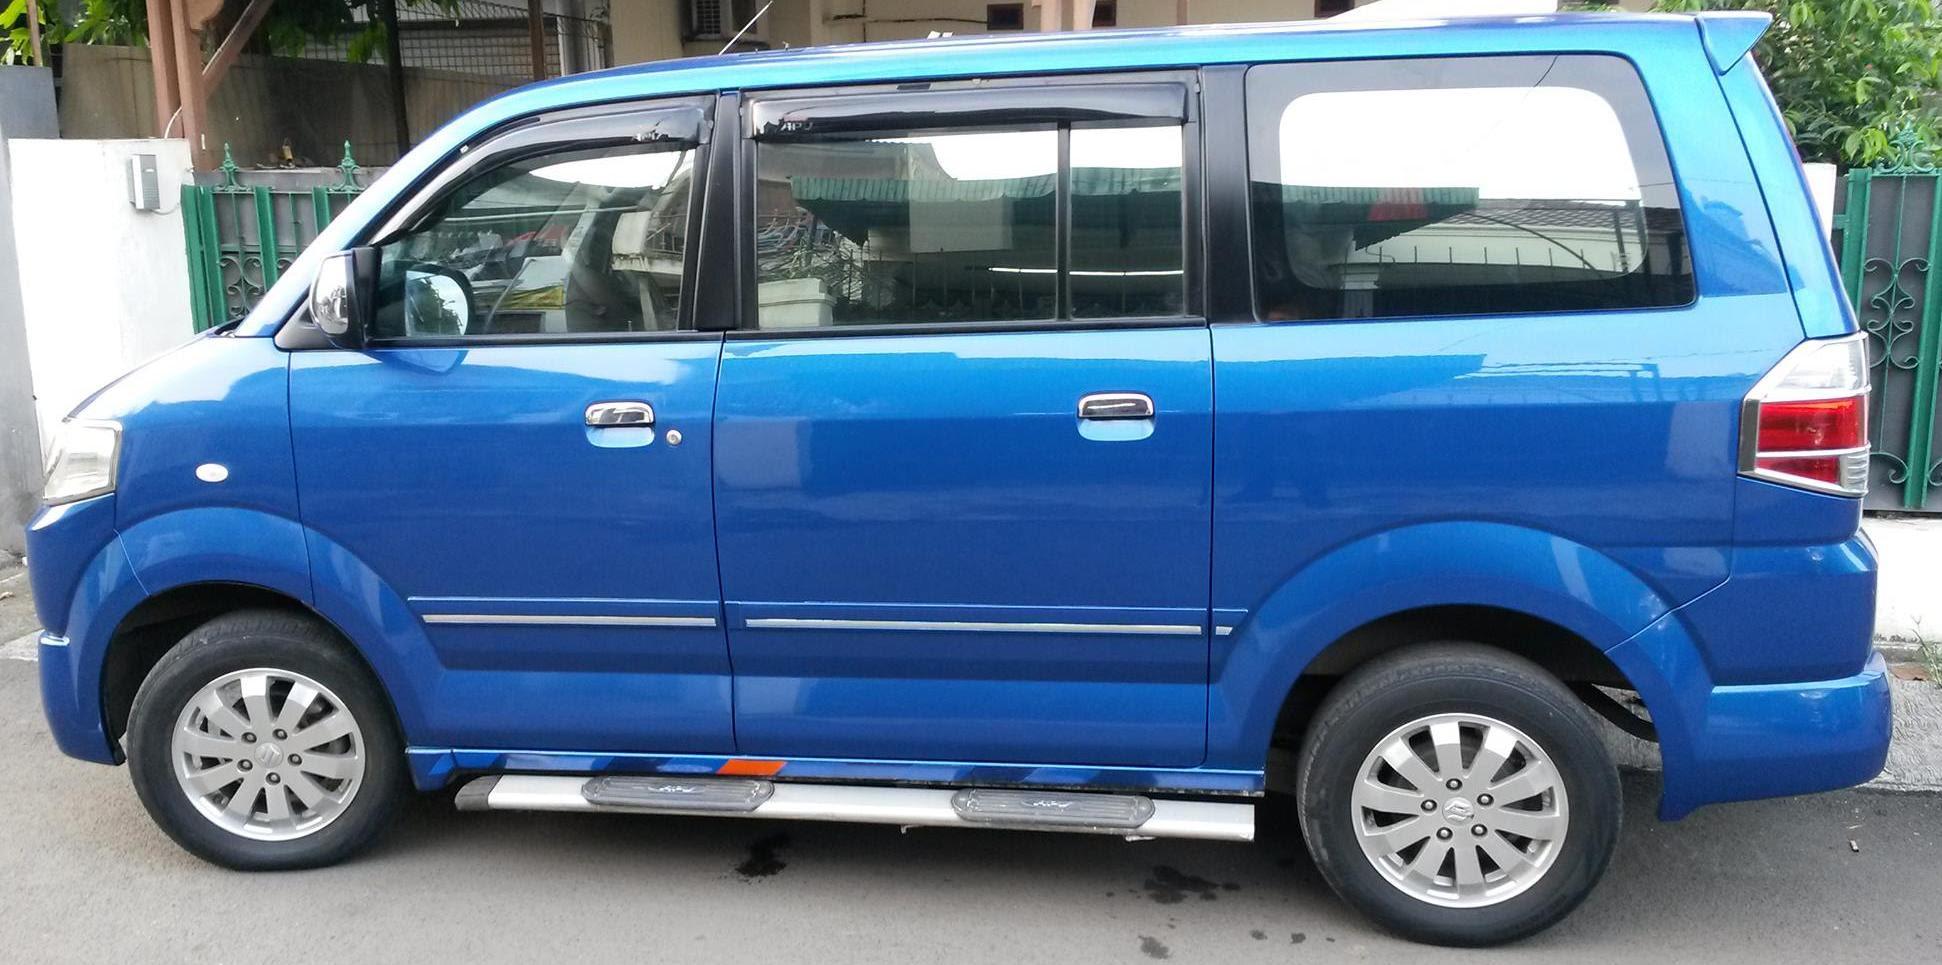 Honda City 2010 Wiring Diagram India